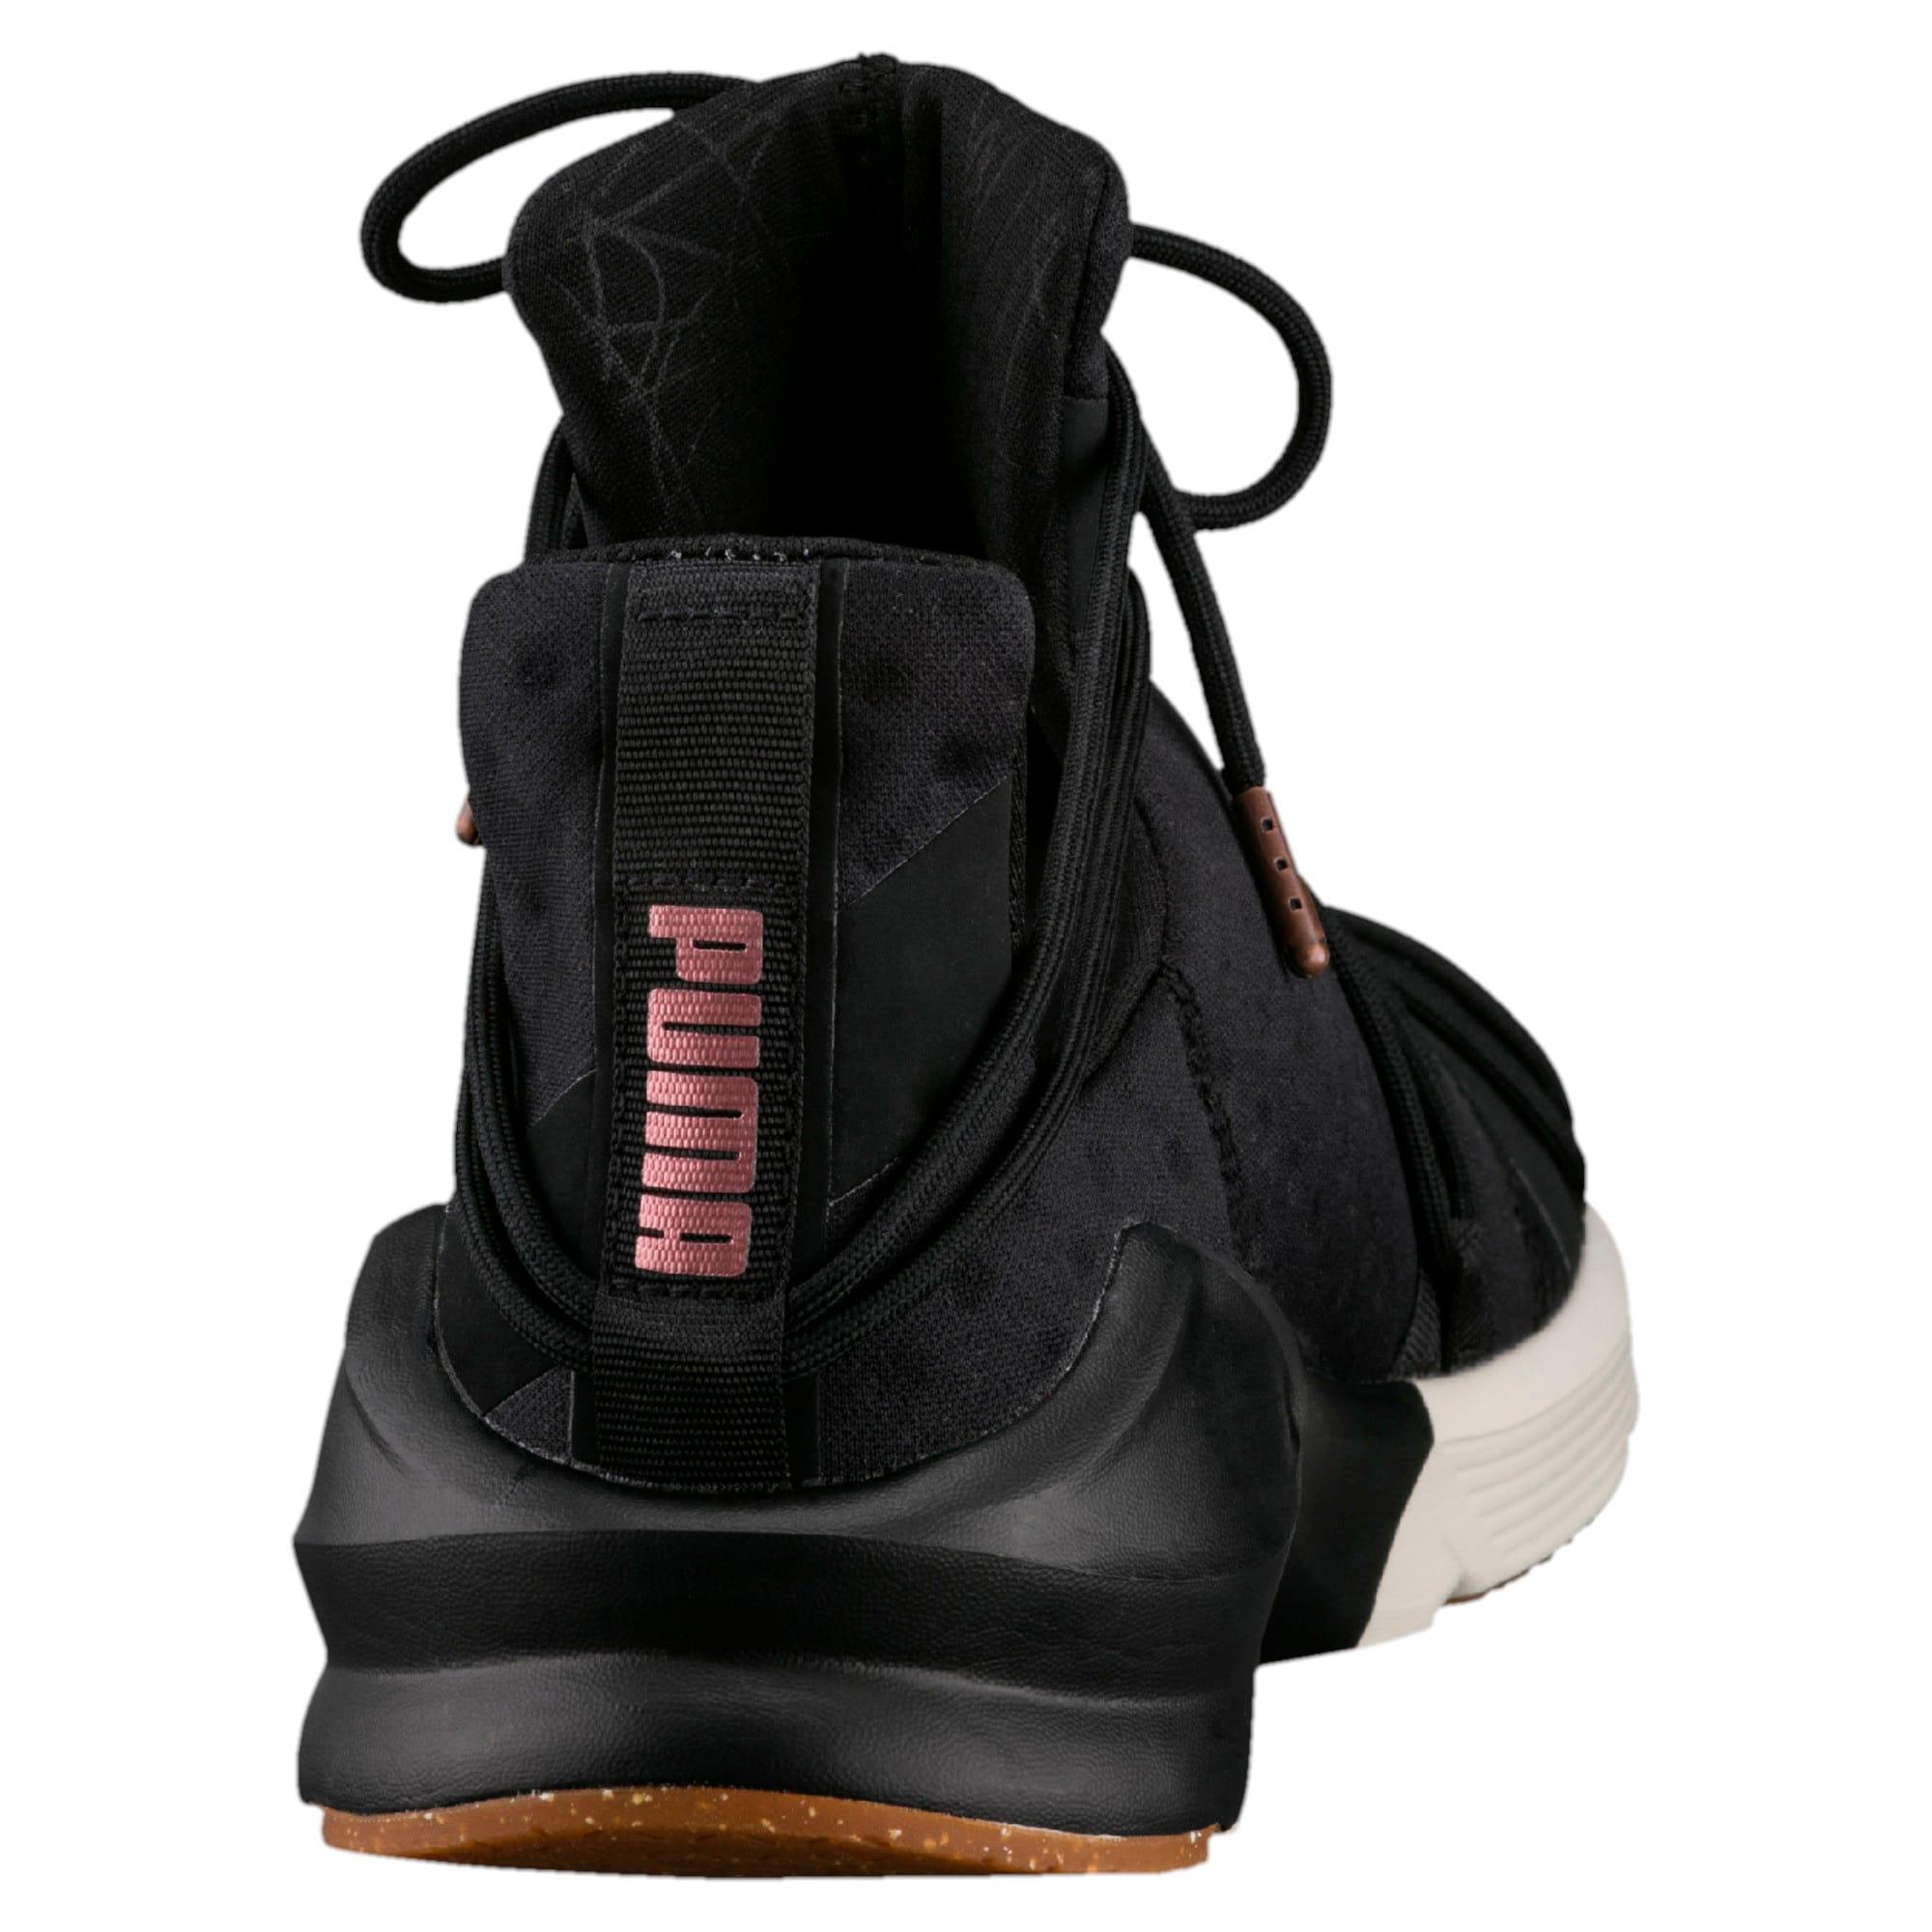 Thumbnail 4 of Fierce Rope VR Women's Training Shoes, Puma Black-Whisper White, medium-IND